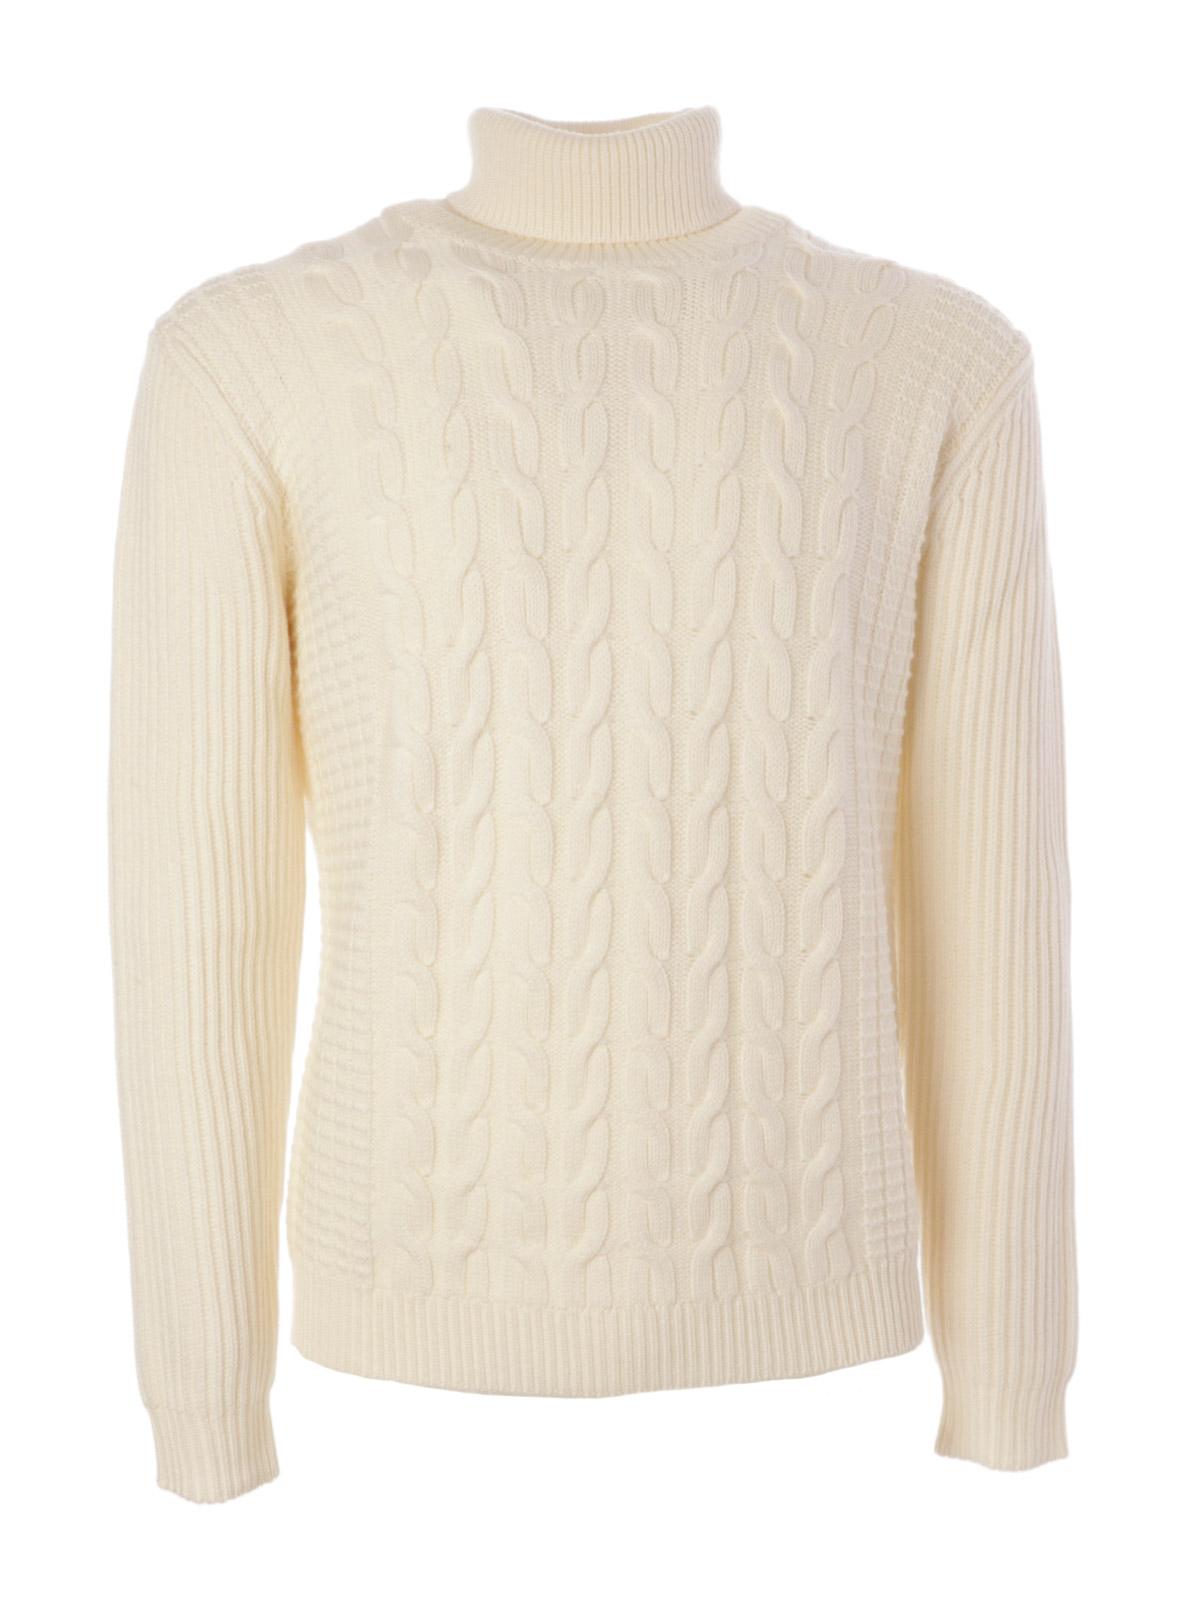 Picture of ALTEA | Men's Turtleneck Cable Sweater